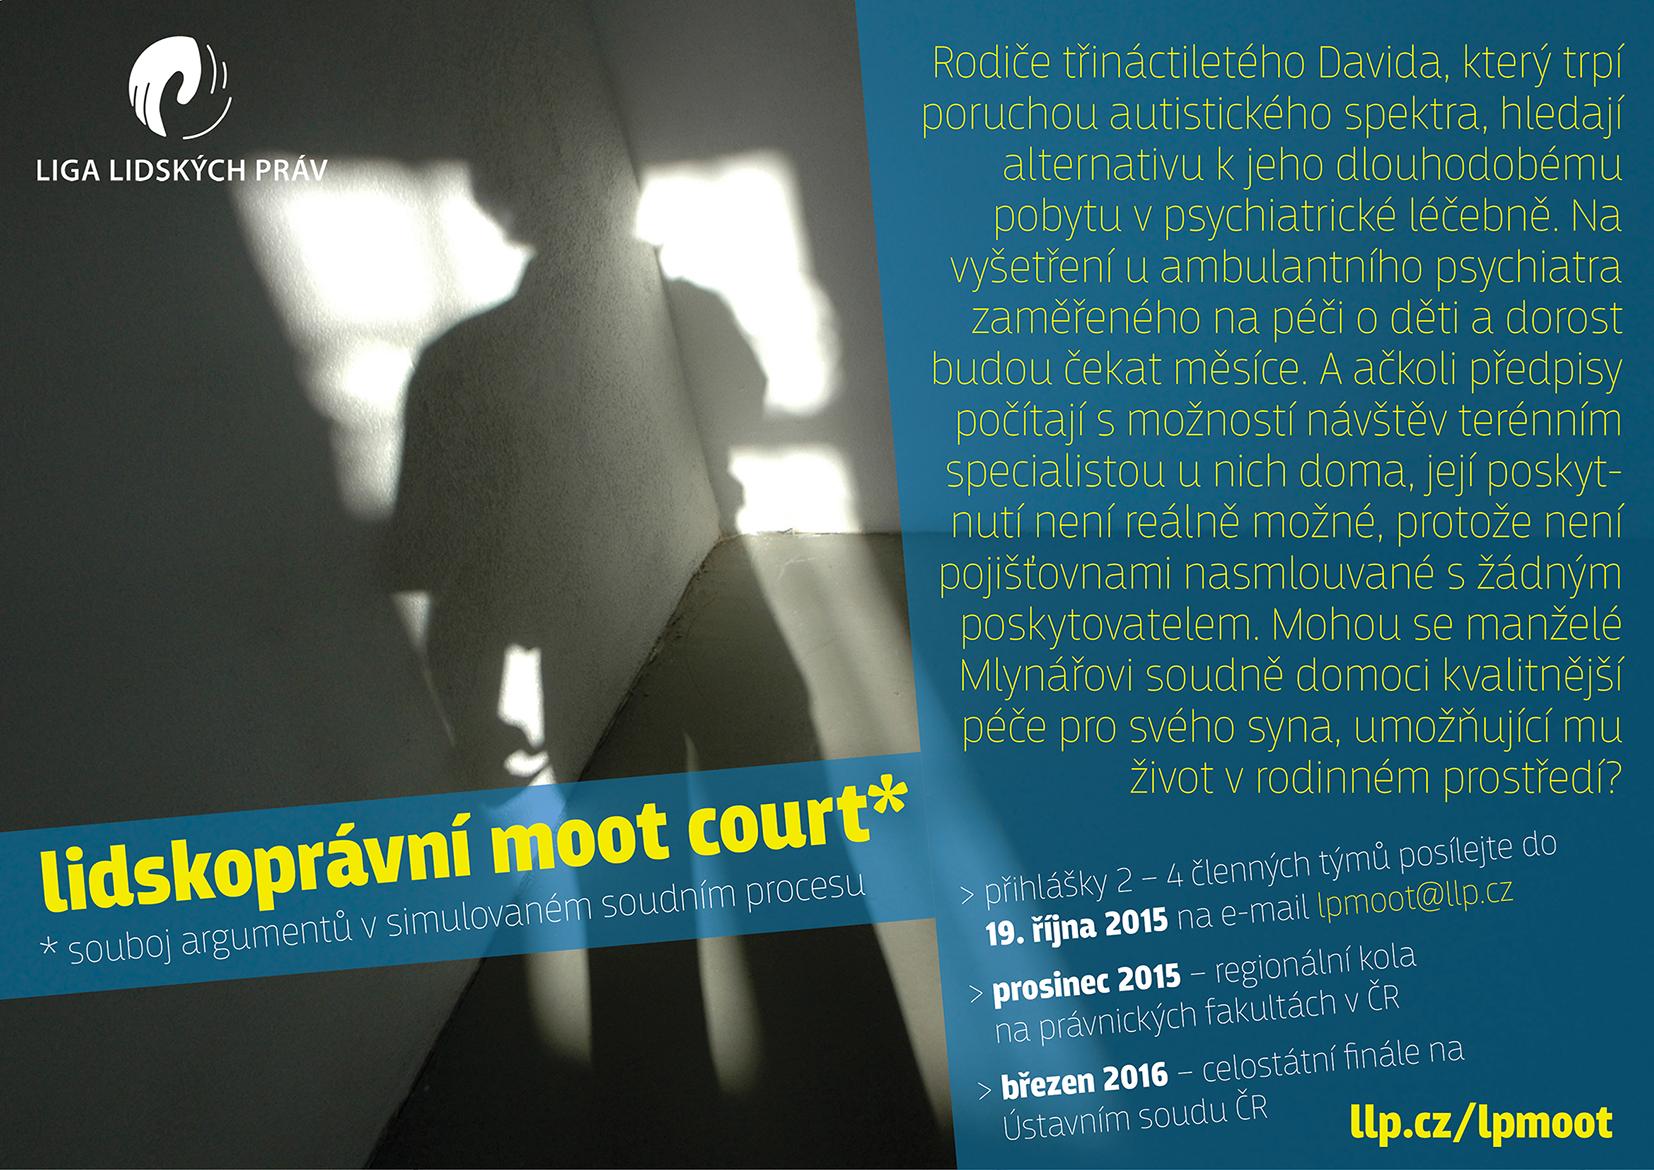 letak_moot_court_2015